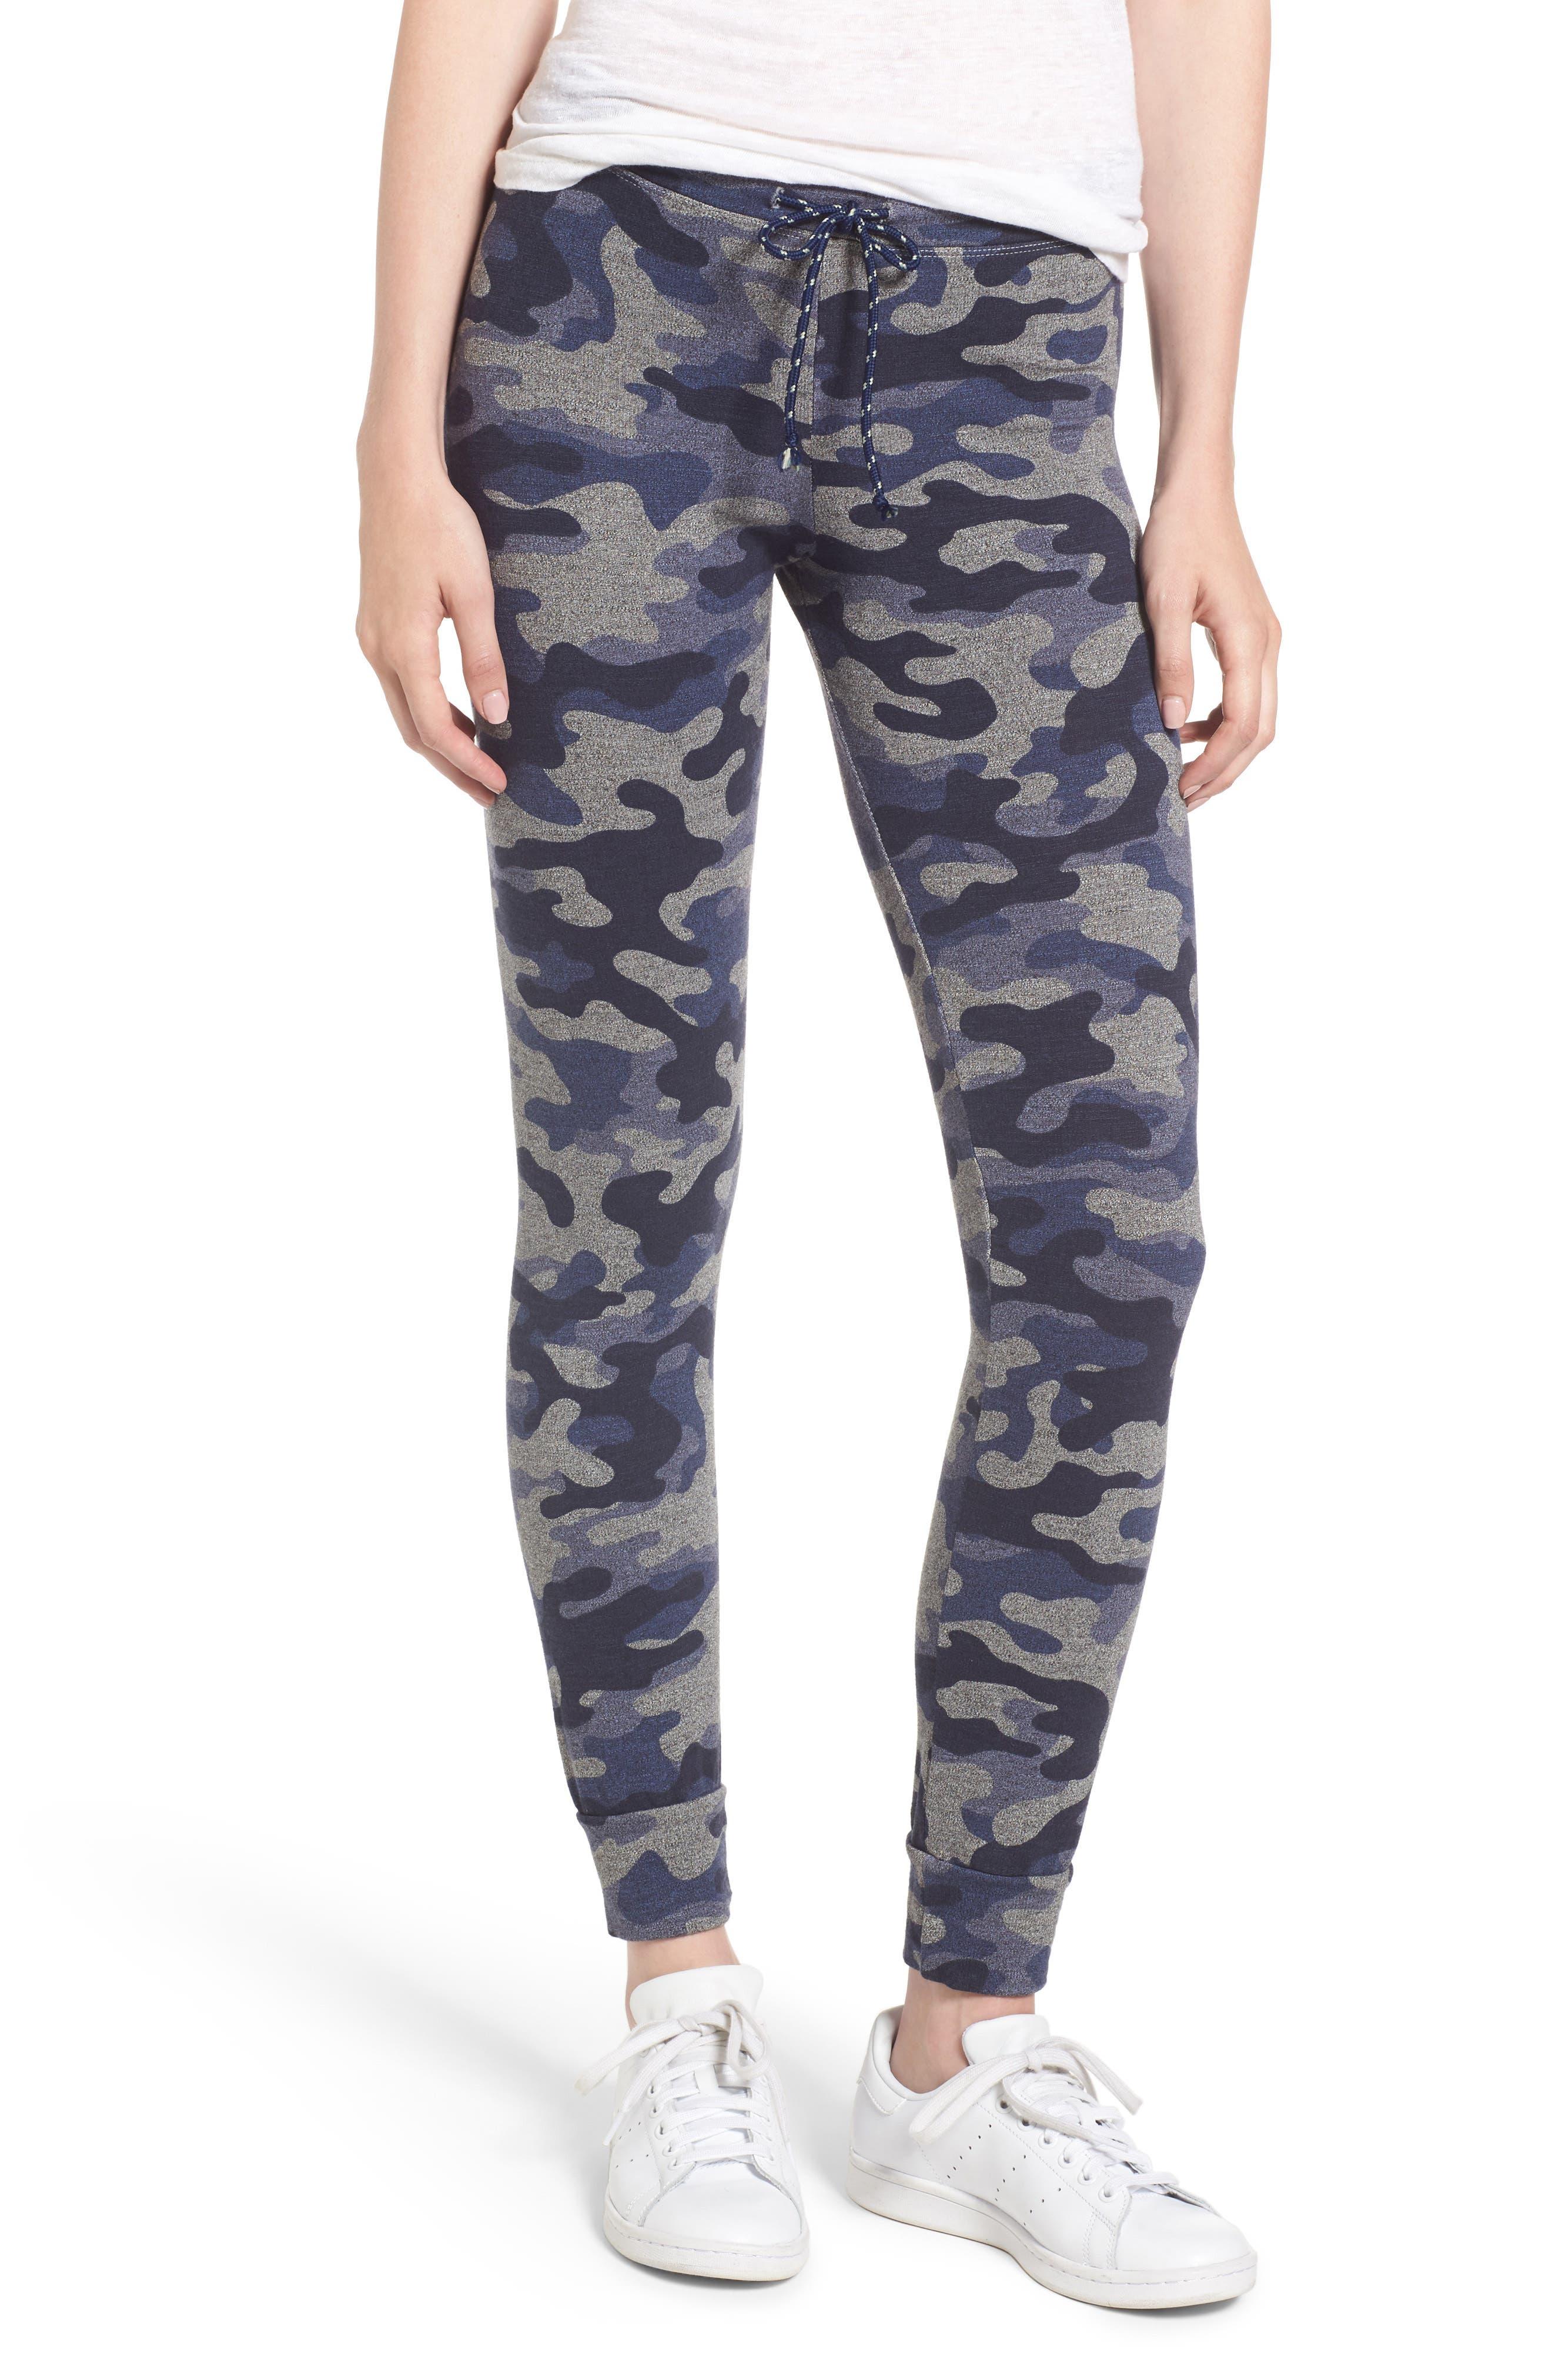 Alternate Image 1 Selected - Sundry Camo Skinny Sweatpants